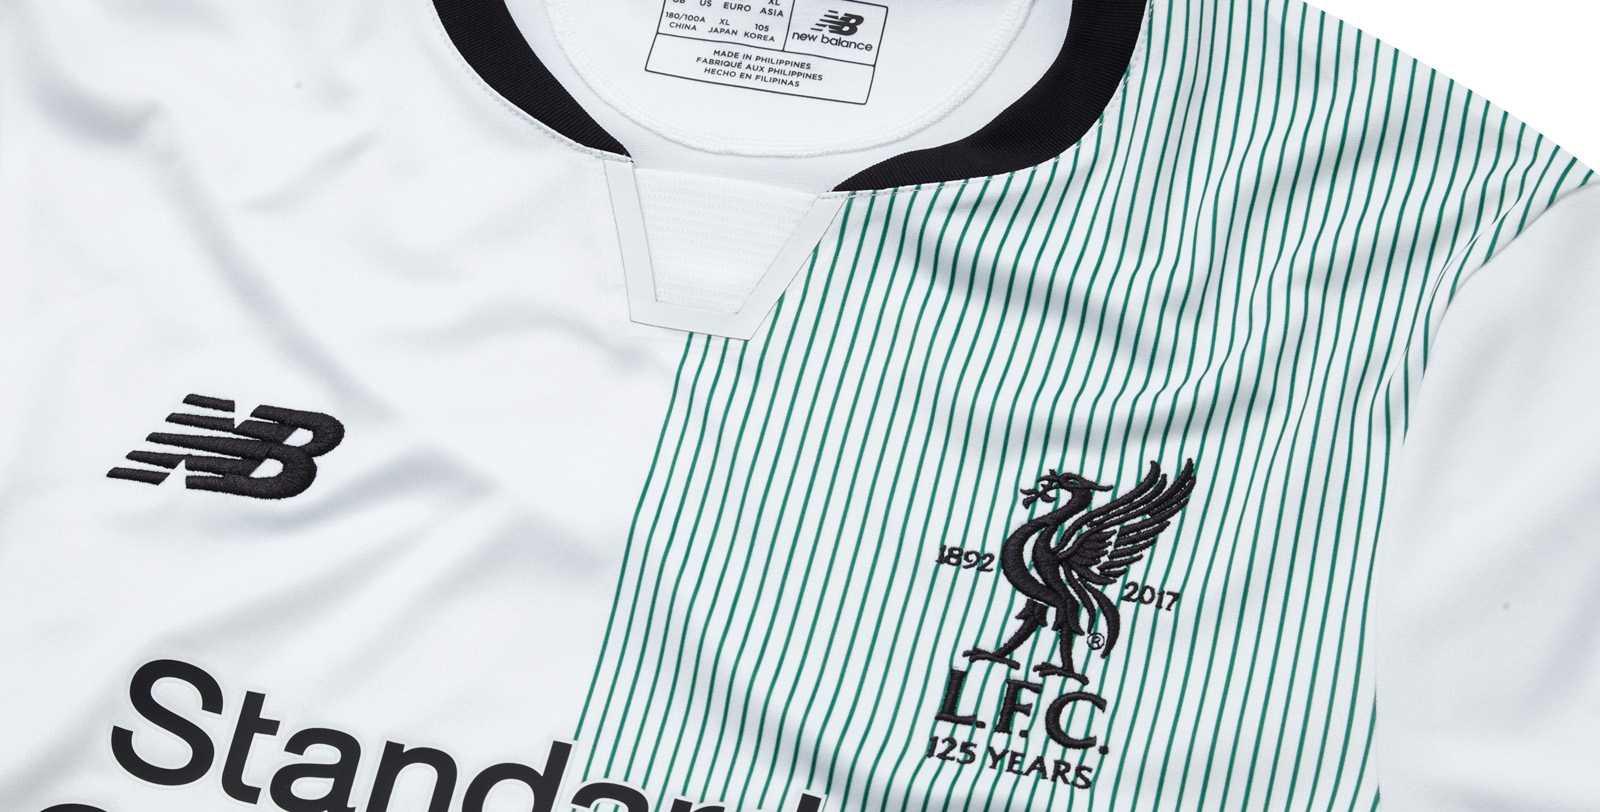 Liverpool ude trøje detaljer